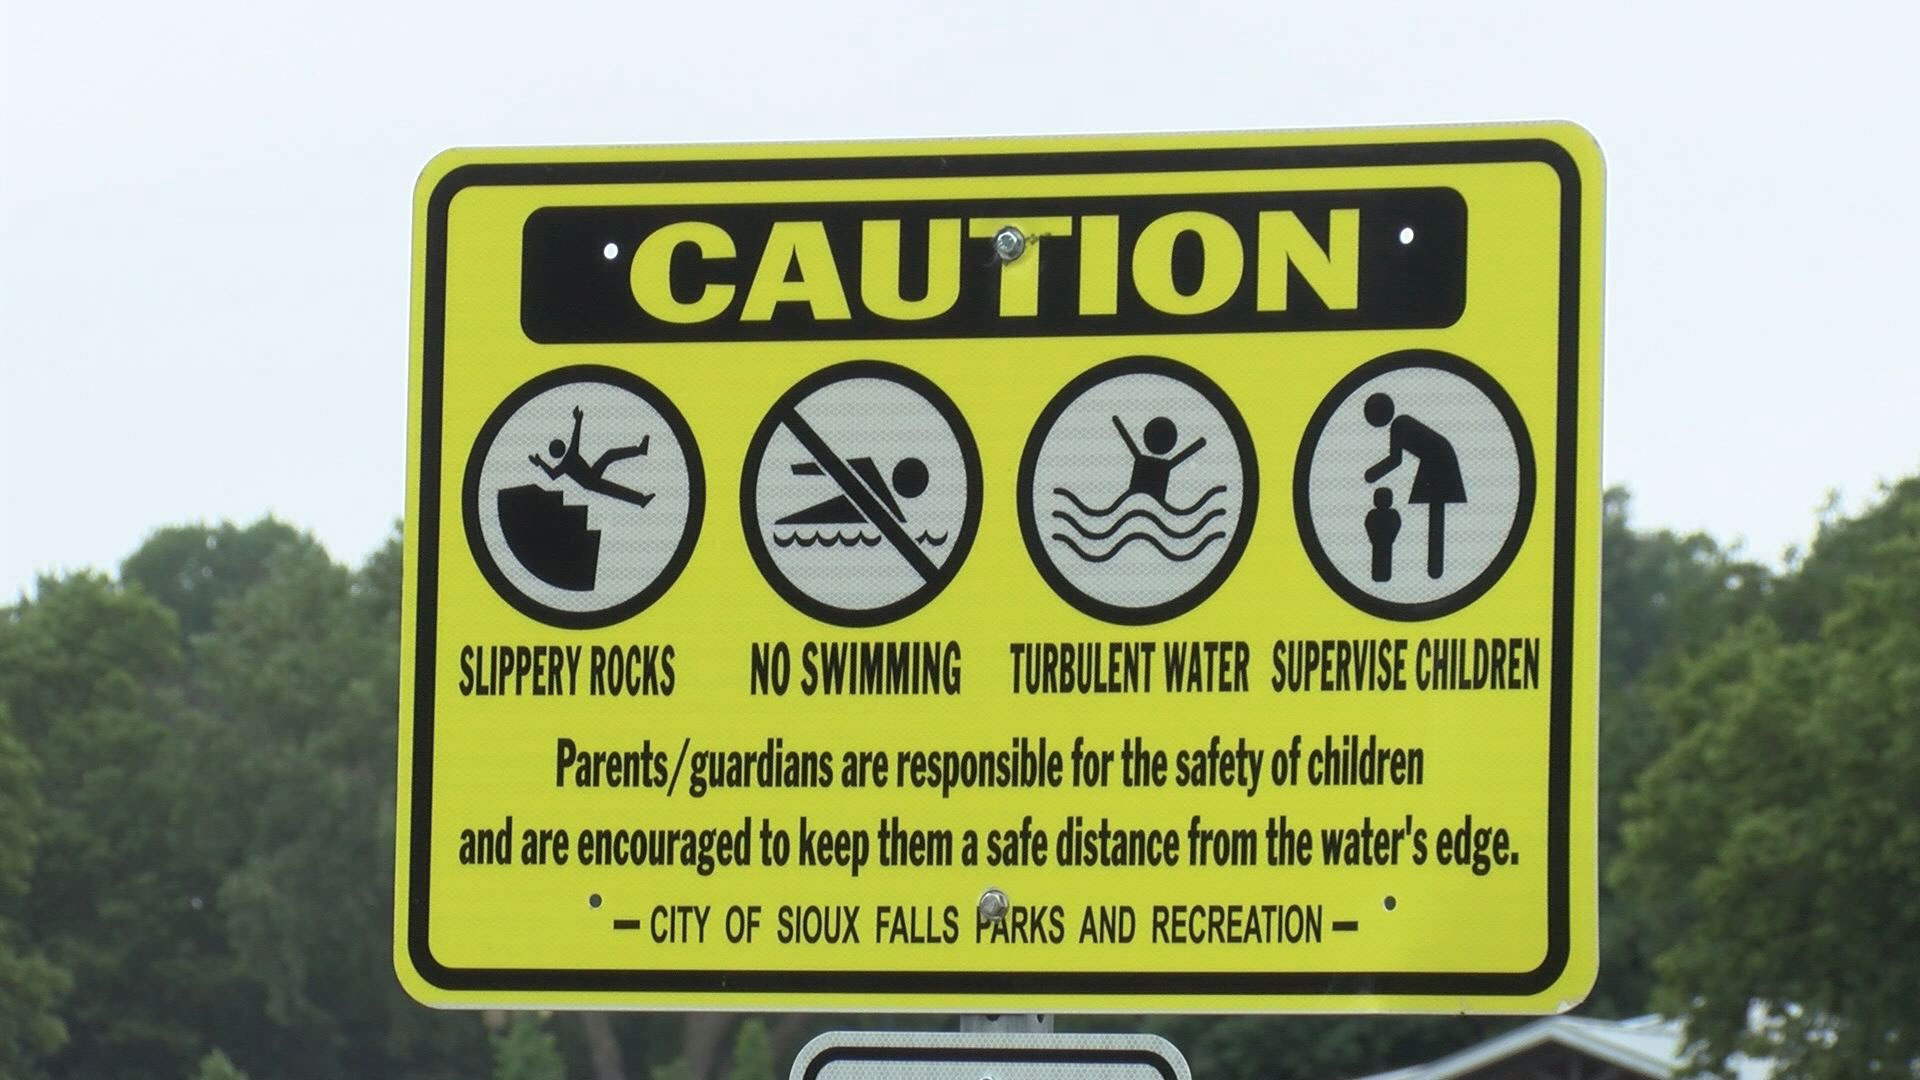 Falls Park Caution Sign_1529377560777.jpg